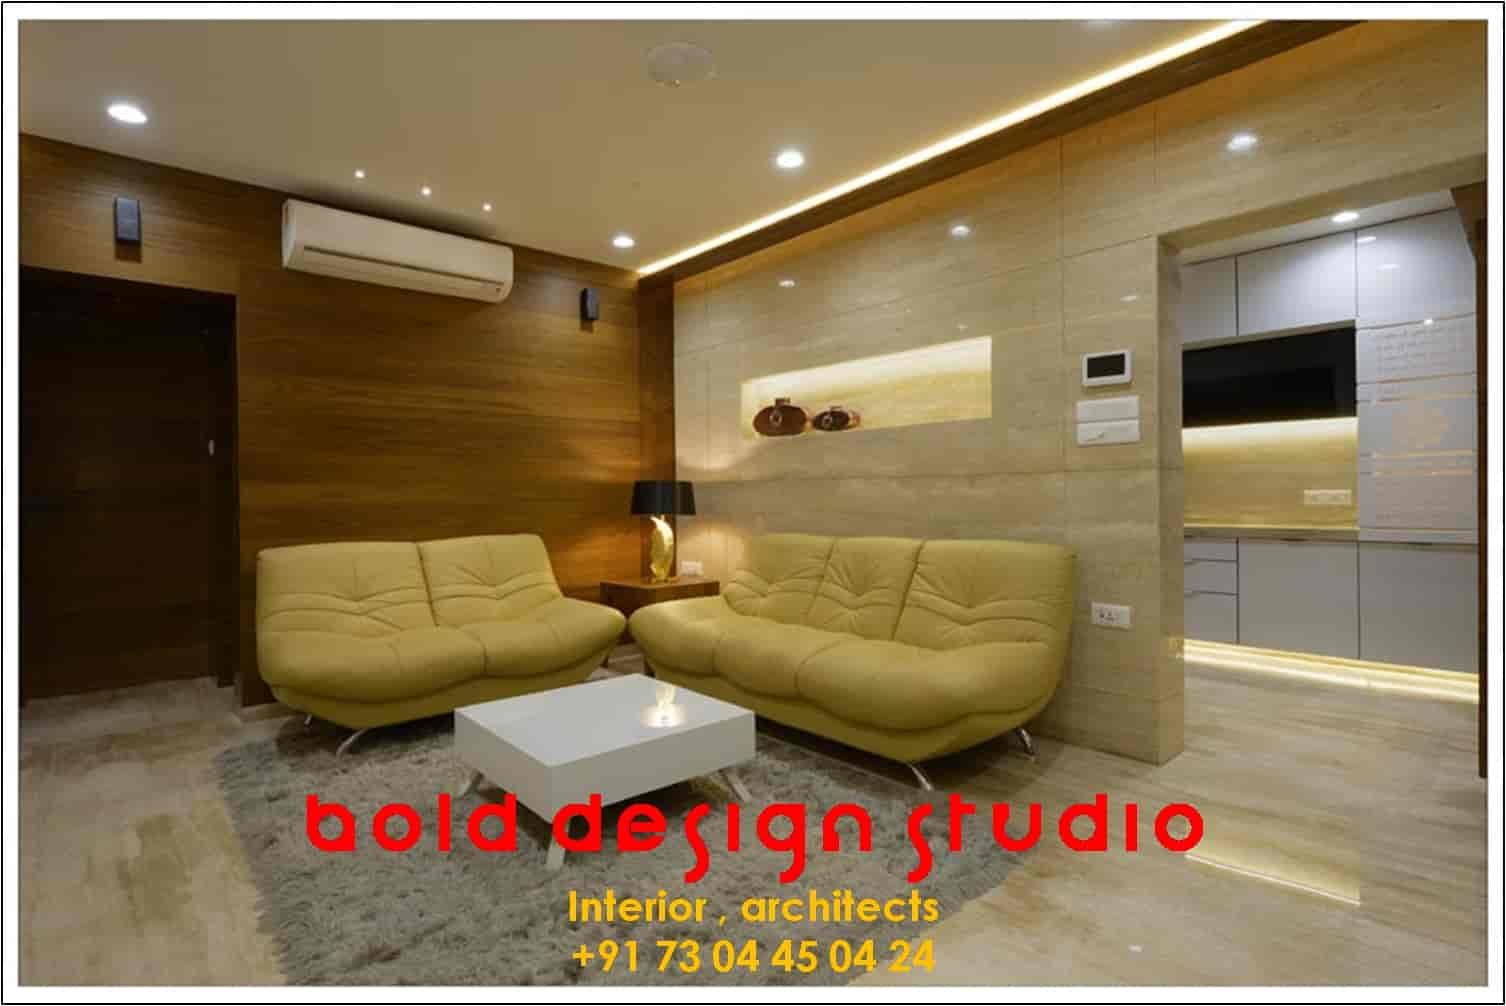 Bold Design Studio Photos Lohegaon Pune Pictures Images